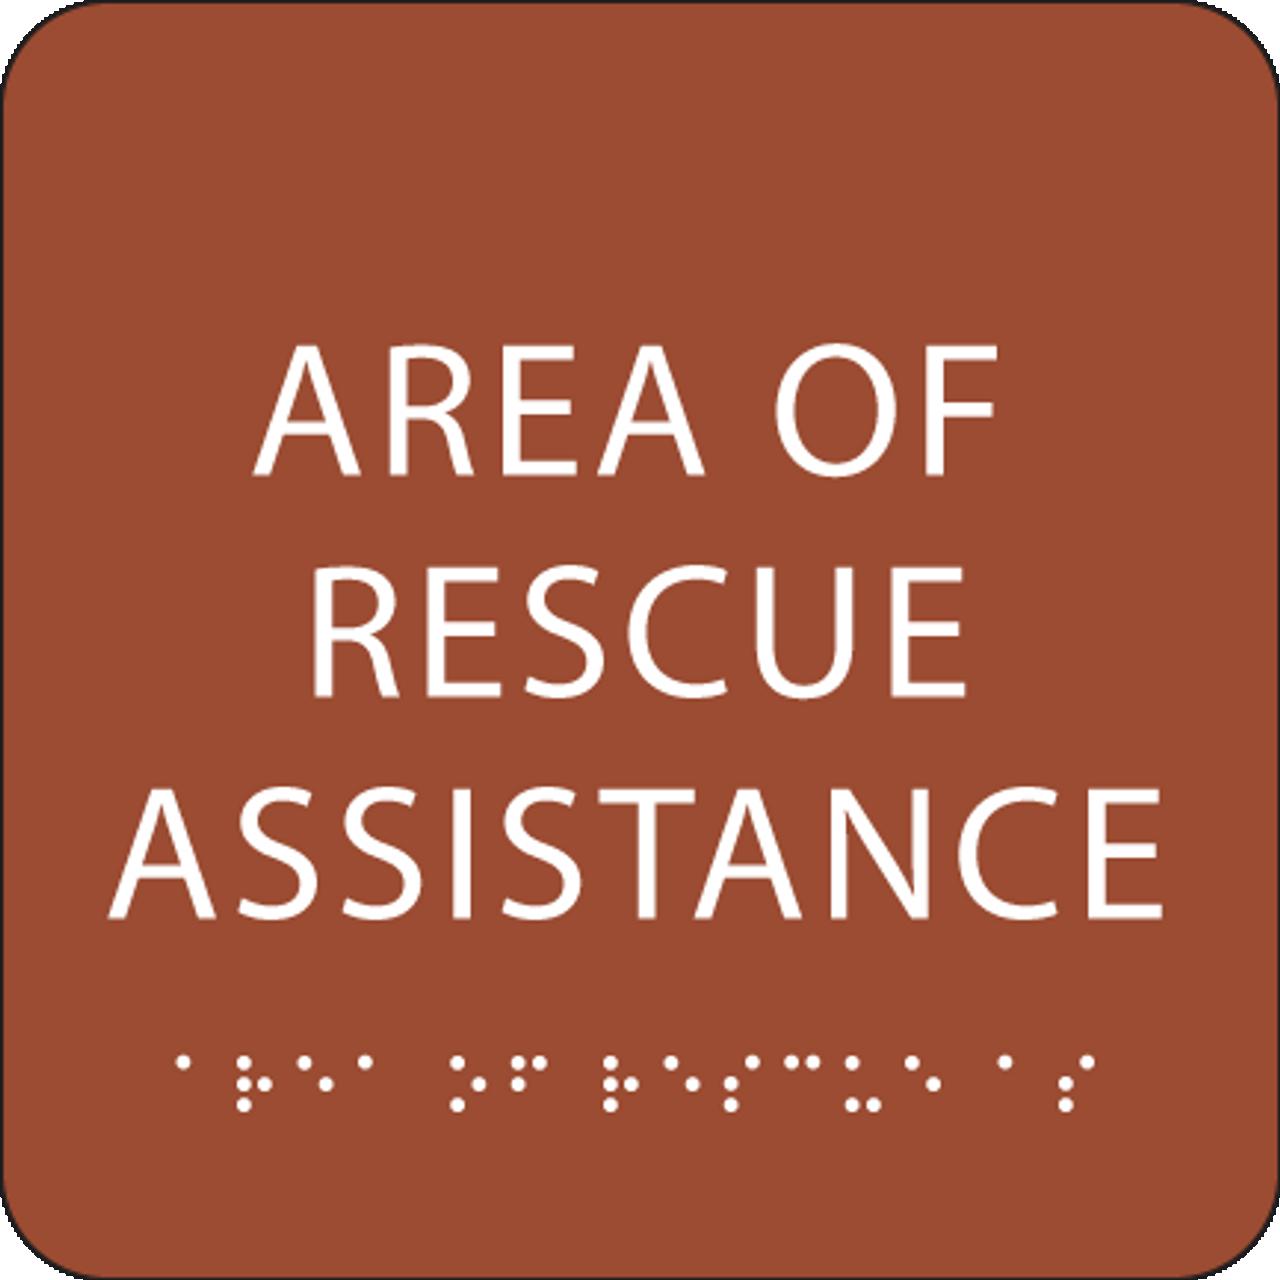 Orange Area of Rescue Assistance ADA Sign